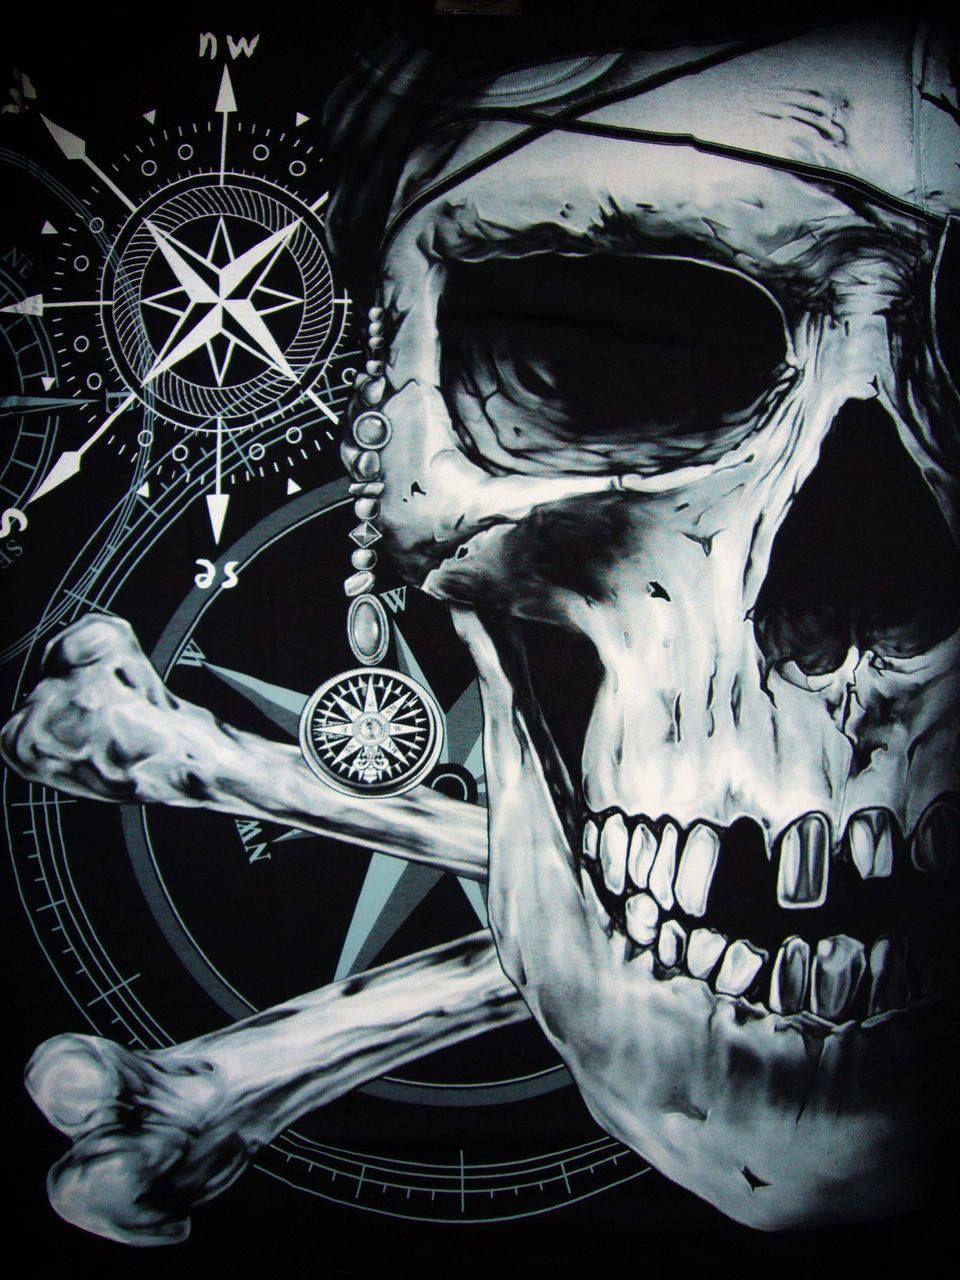 Pirate skull.